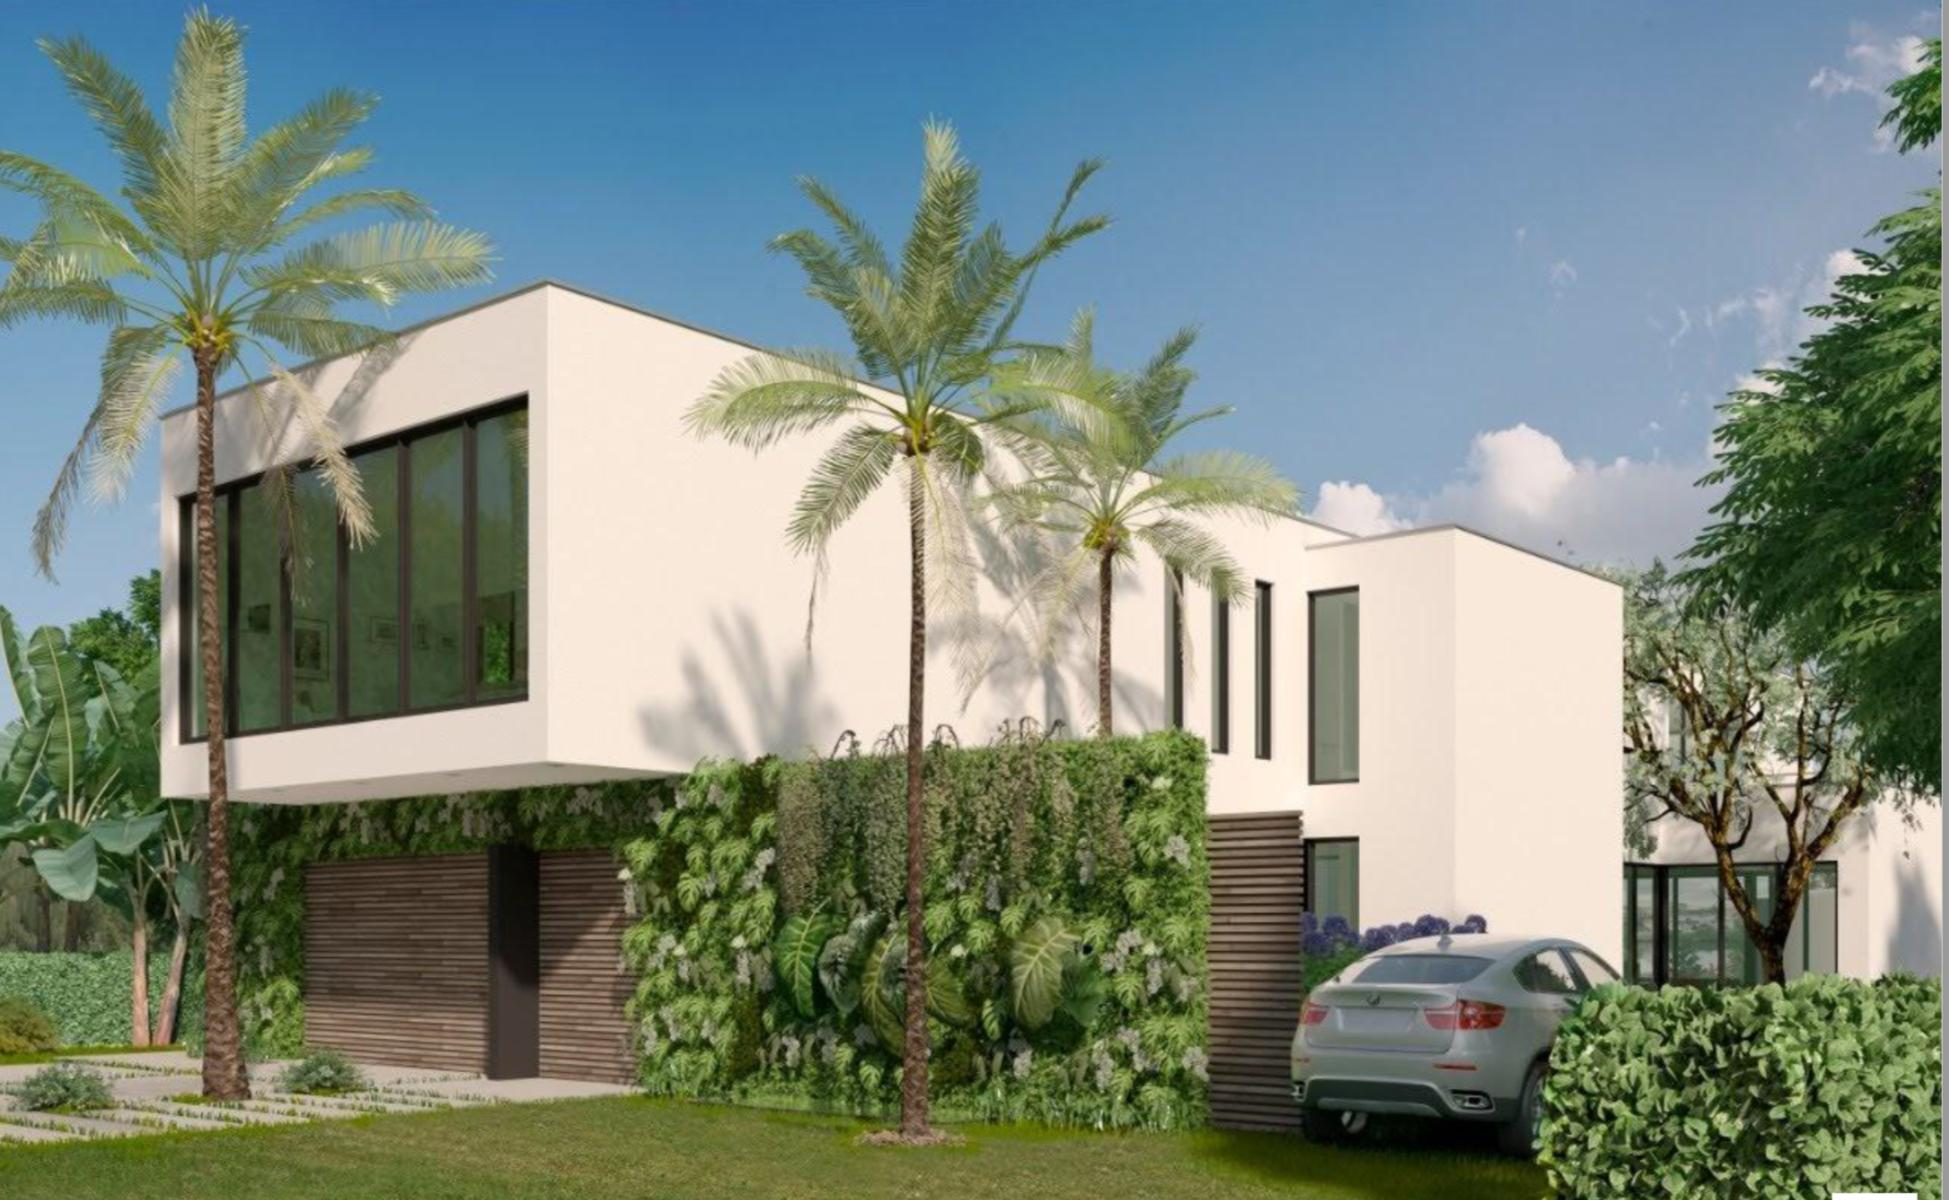 222 Atlantic Drive, Lantana, Florida 33462, 4 Bedrooms Bedrooms, ,4.1 BathroomsBathrooms,Single Family,For Sale,Atlantic,RX-10499649